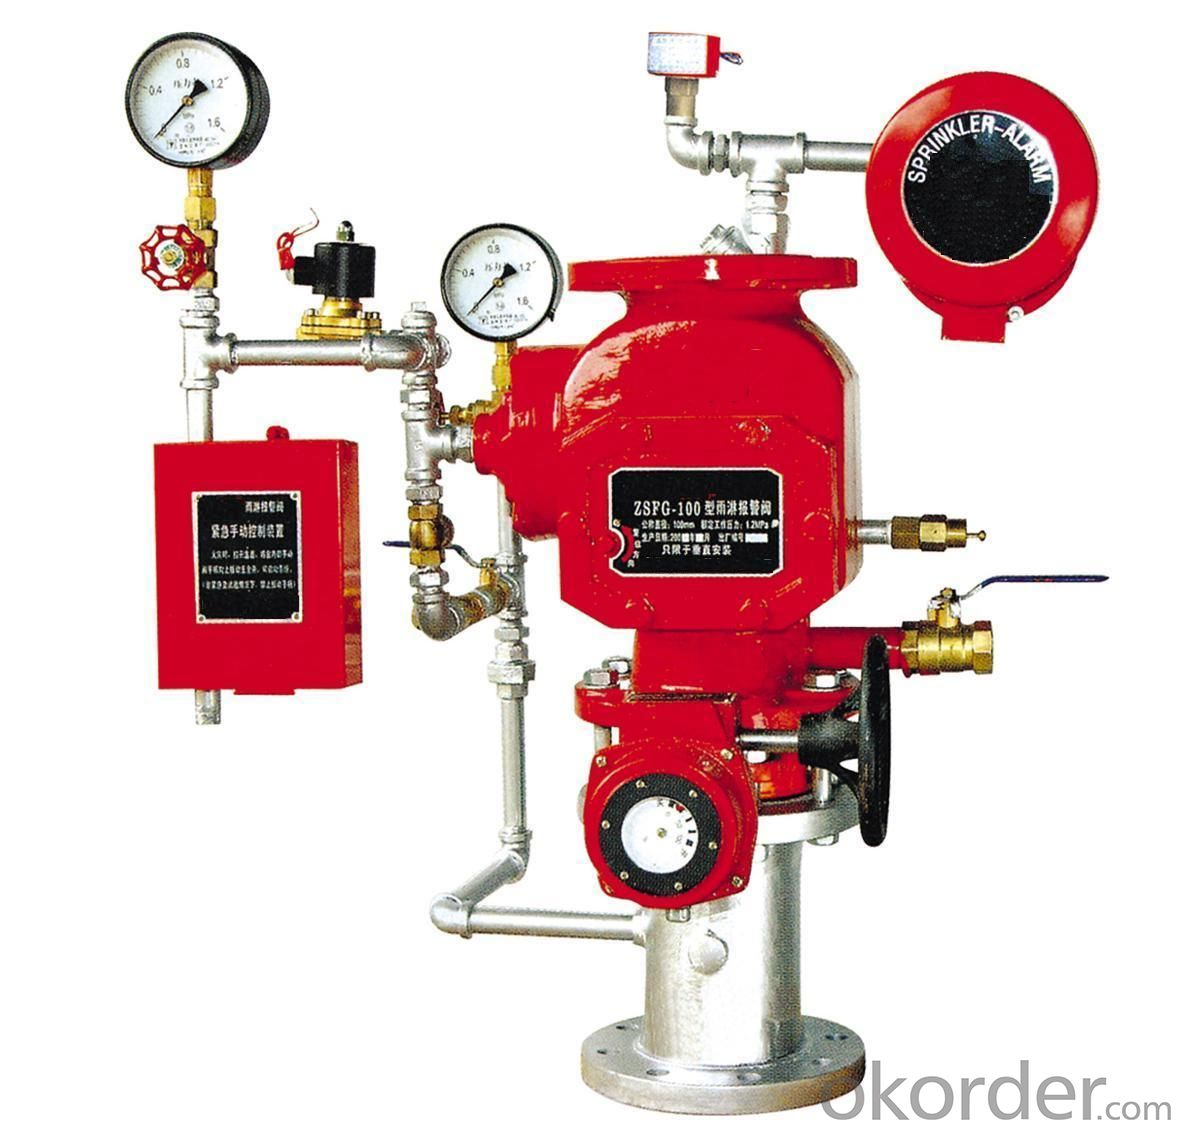 4 types of sprinkler systems pdf